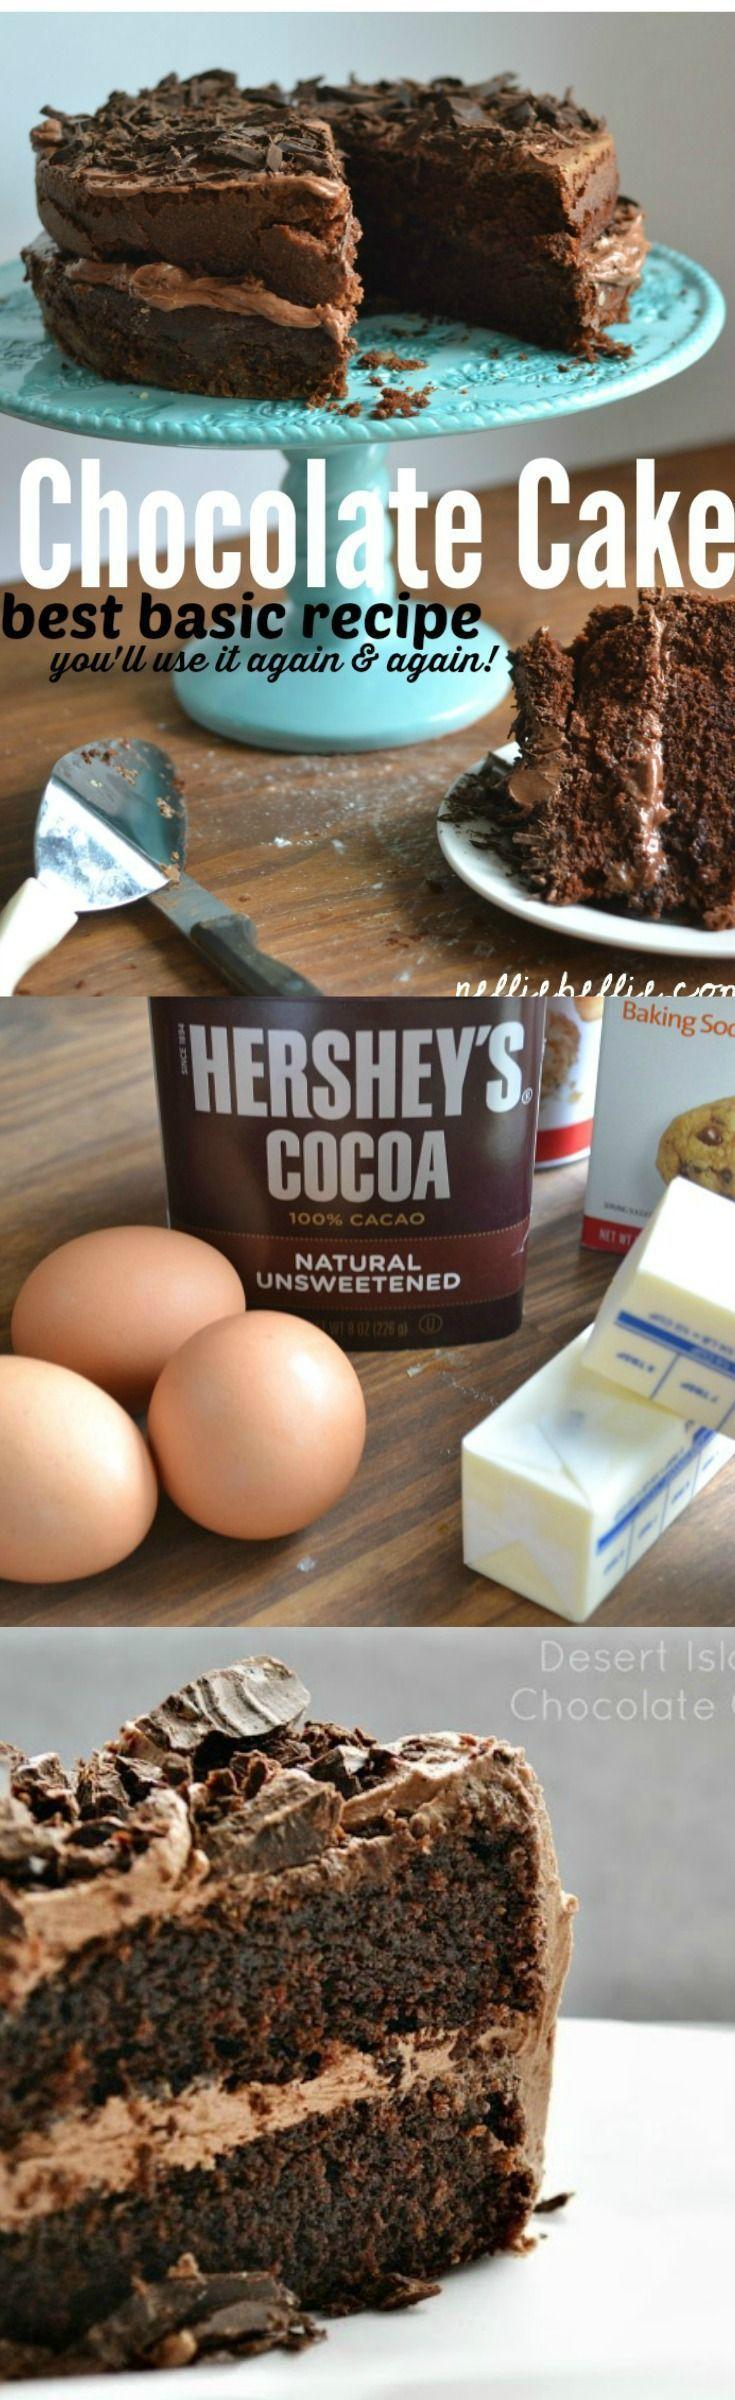 Homemade Chocolate Cake Recipe Homemade chocolate frosting